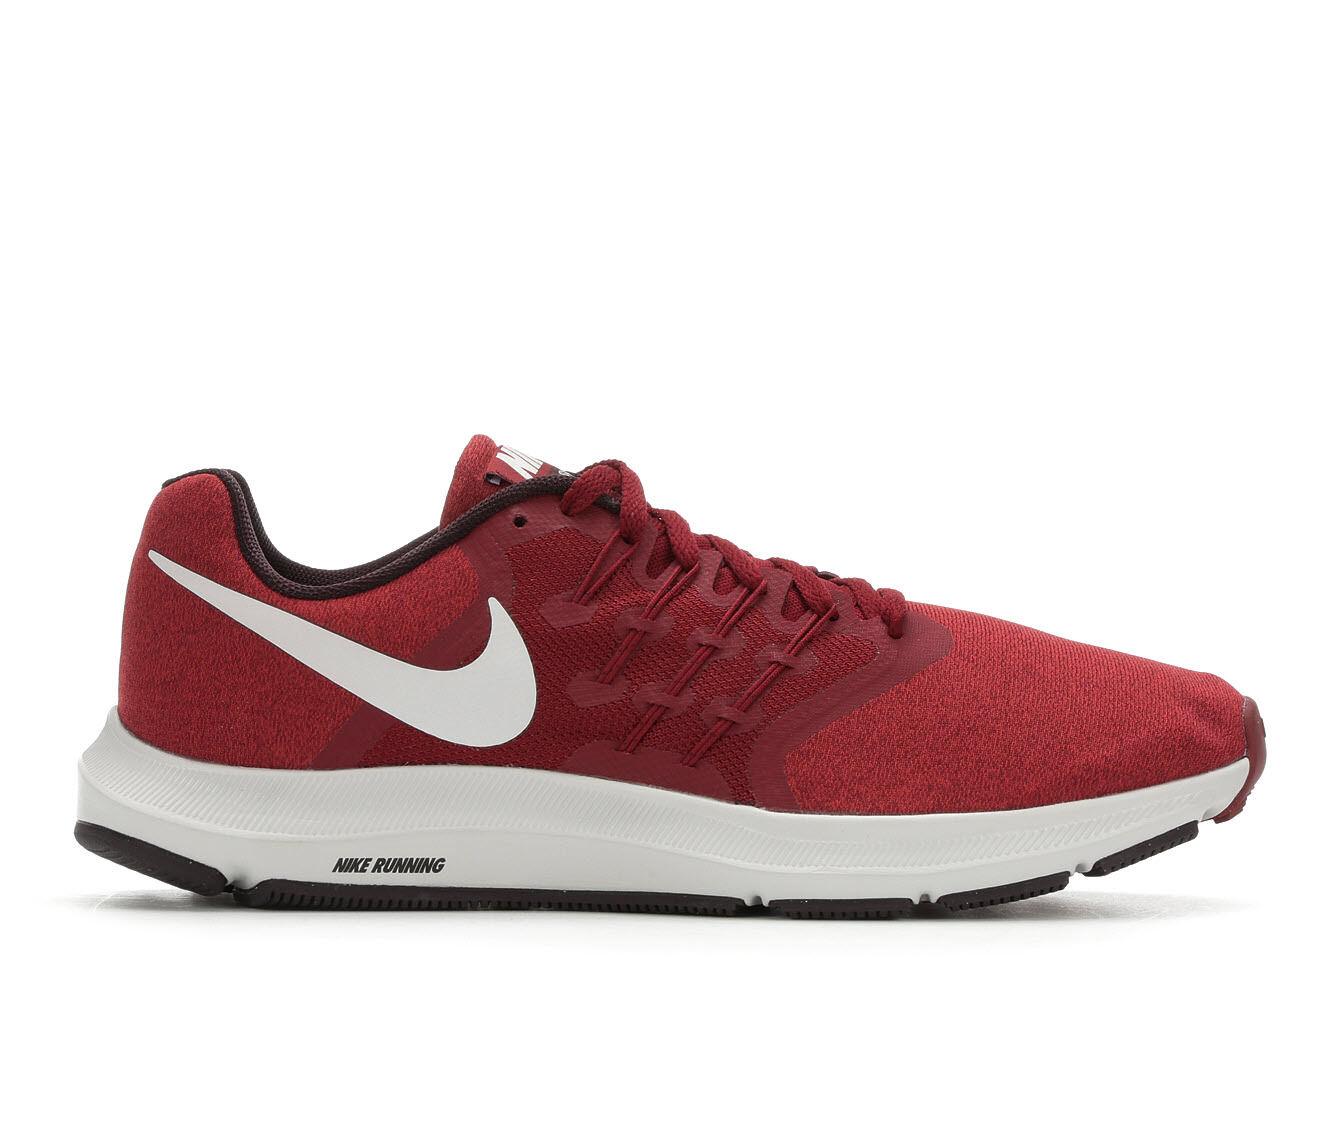 Men's Nike Run Swift Running Shoes Red/Blk/Wht